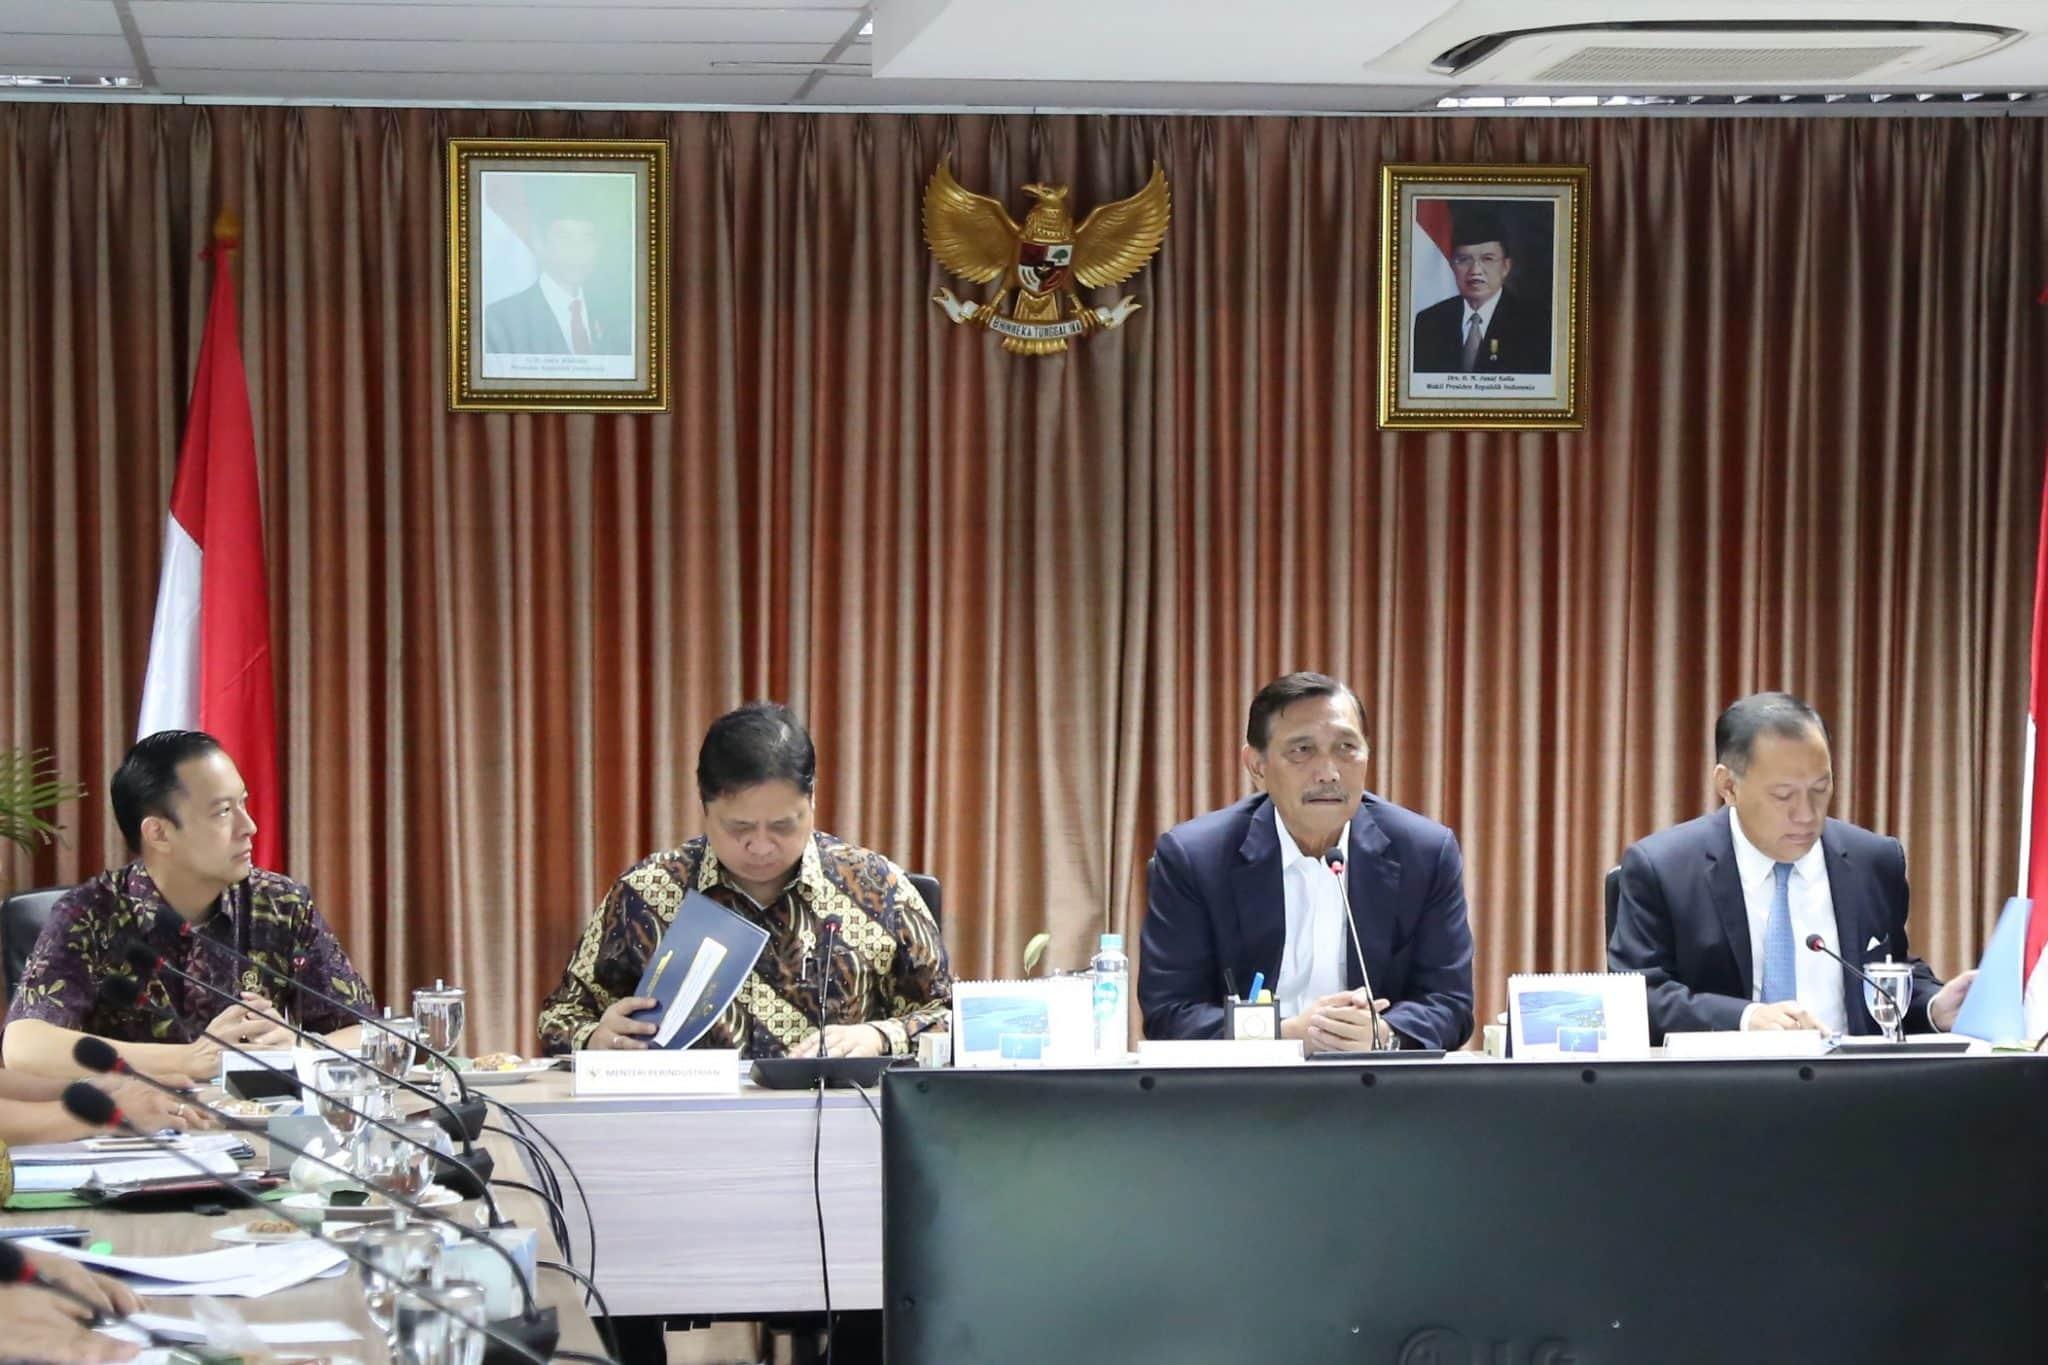 Rapat Koordinasi tentang Pengembangan Kawasan Industri Kaltara